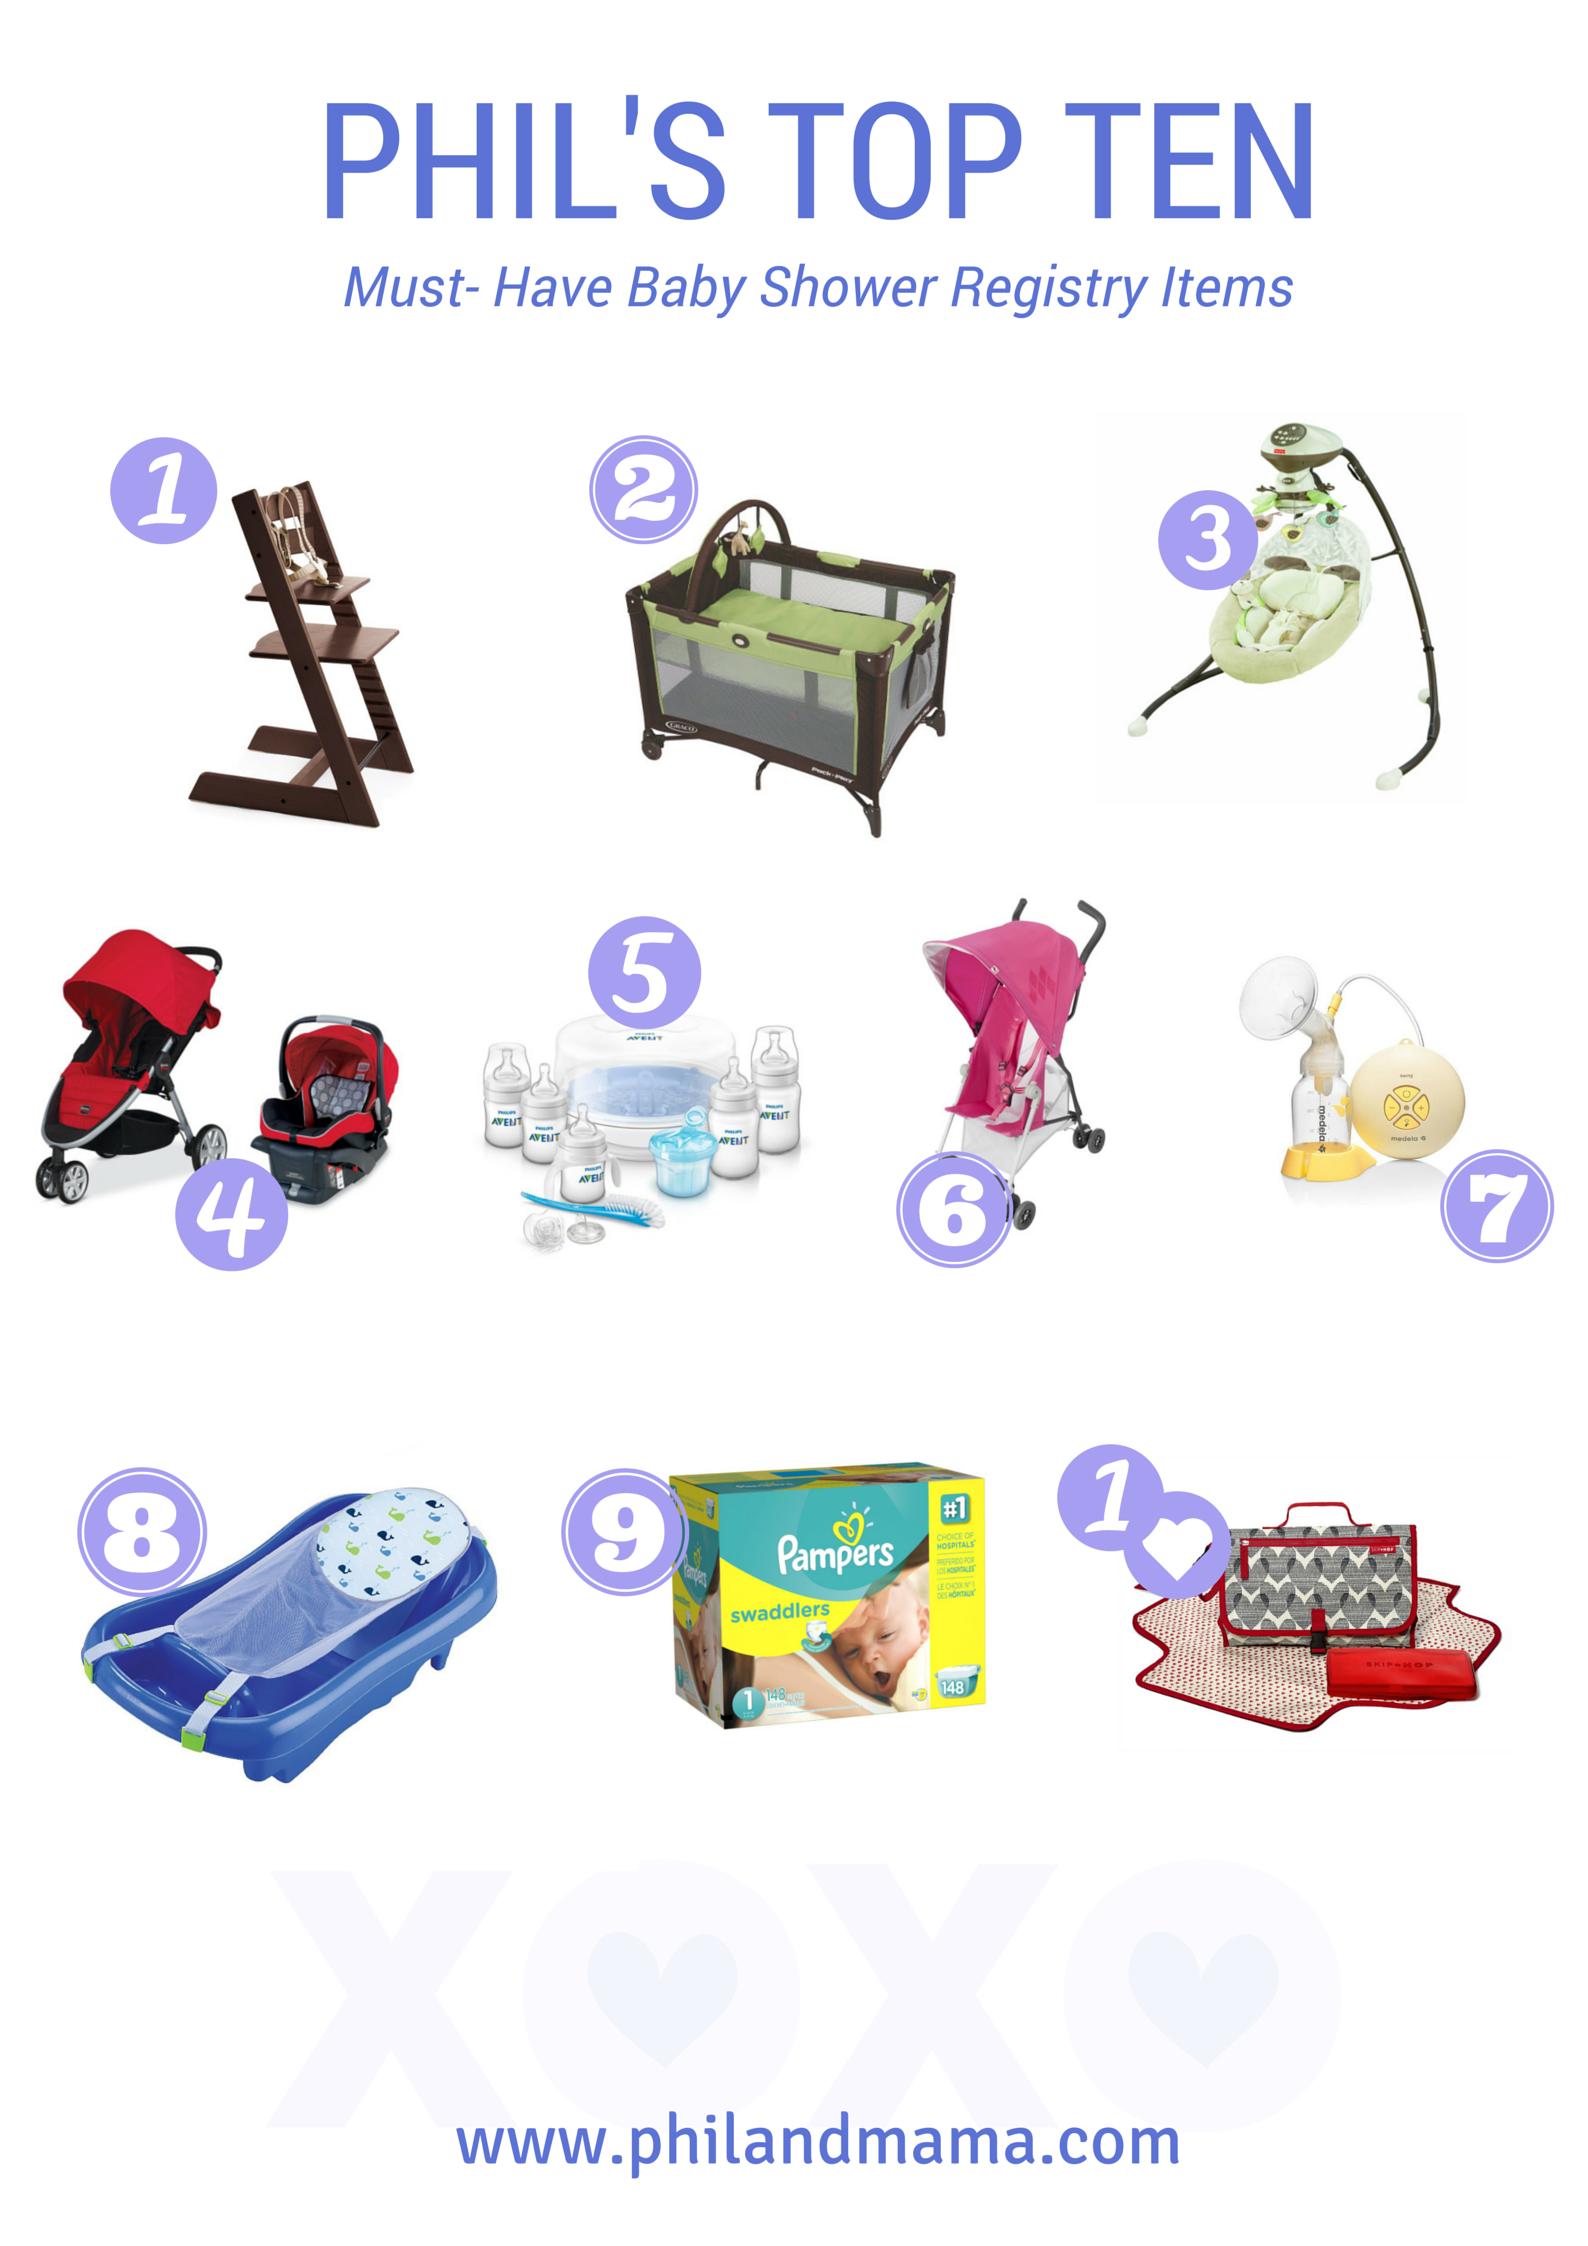 Baby Phil's top ten baby shower registry must-have list items